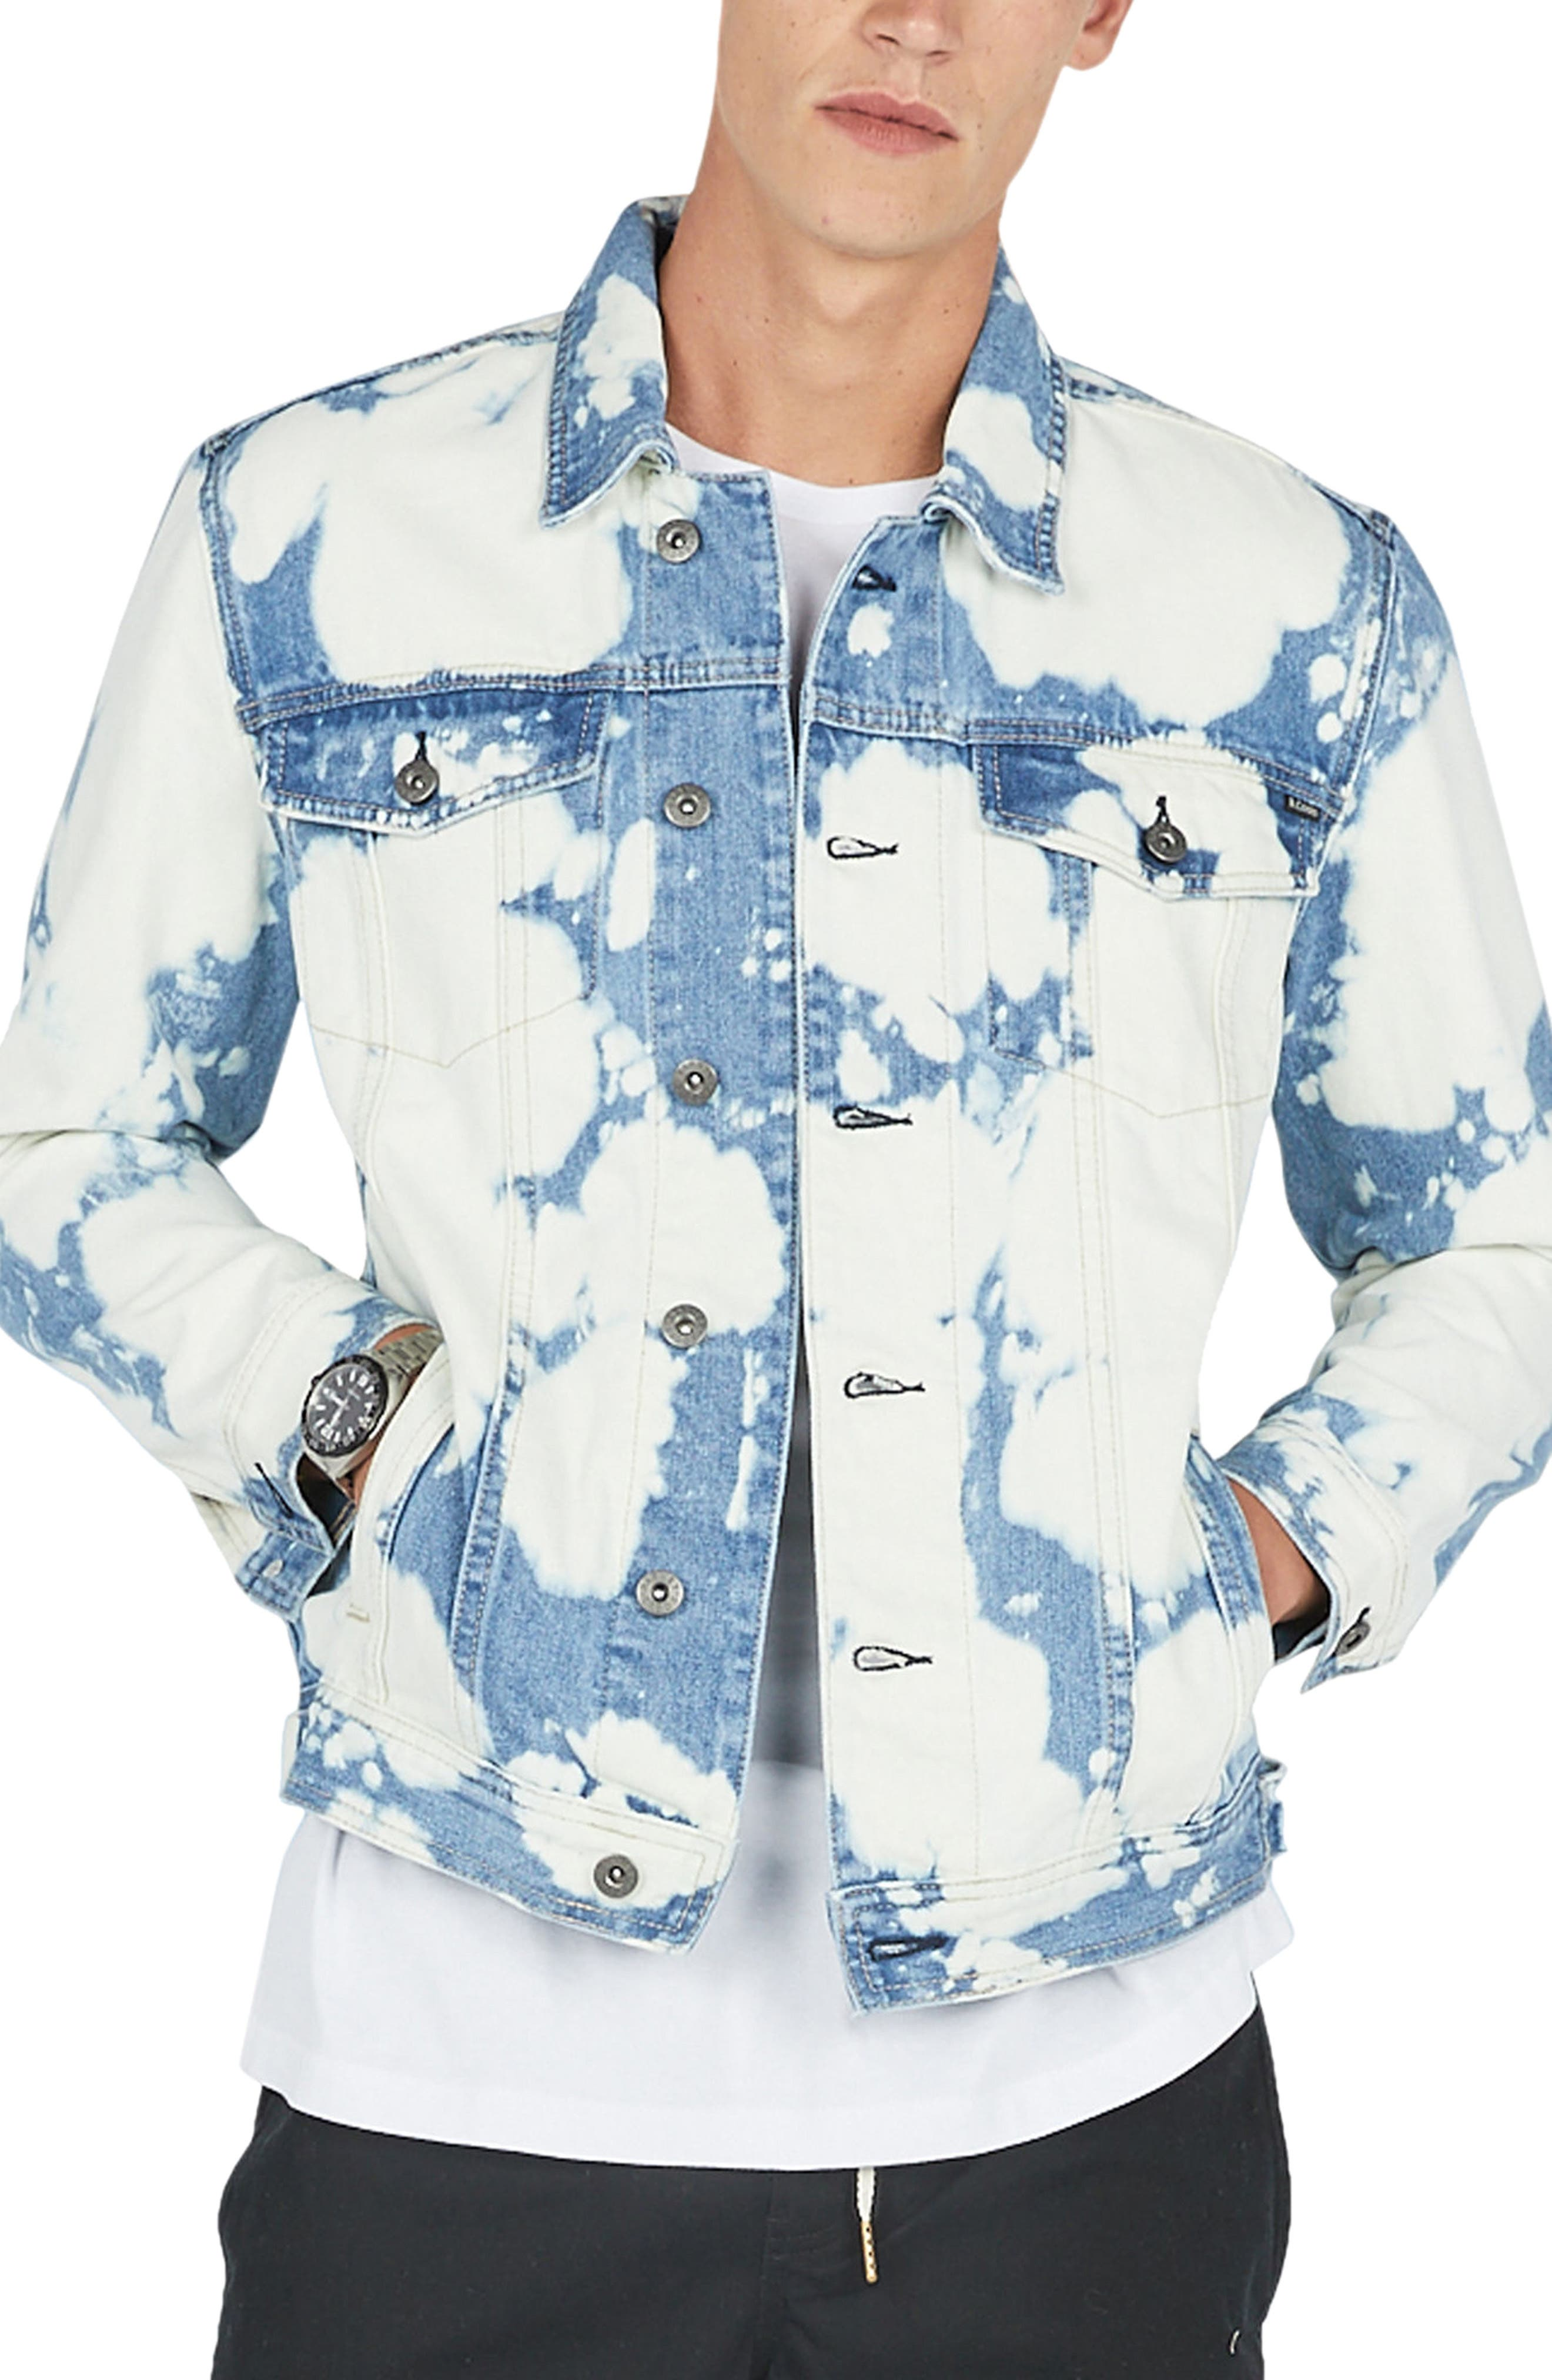 B. Rigid Denim Jacket,                             Main thumbnail 1, color,                             Bleached Blue